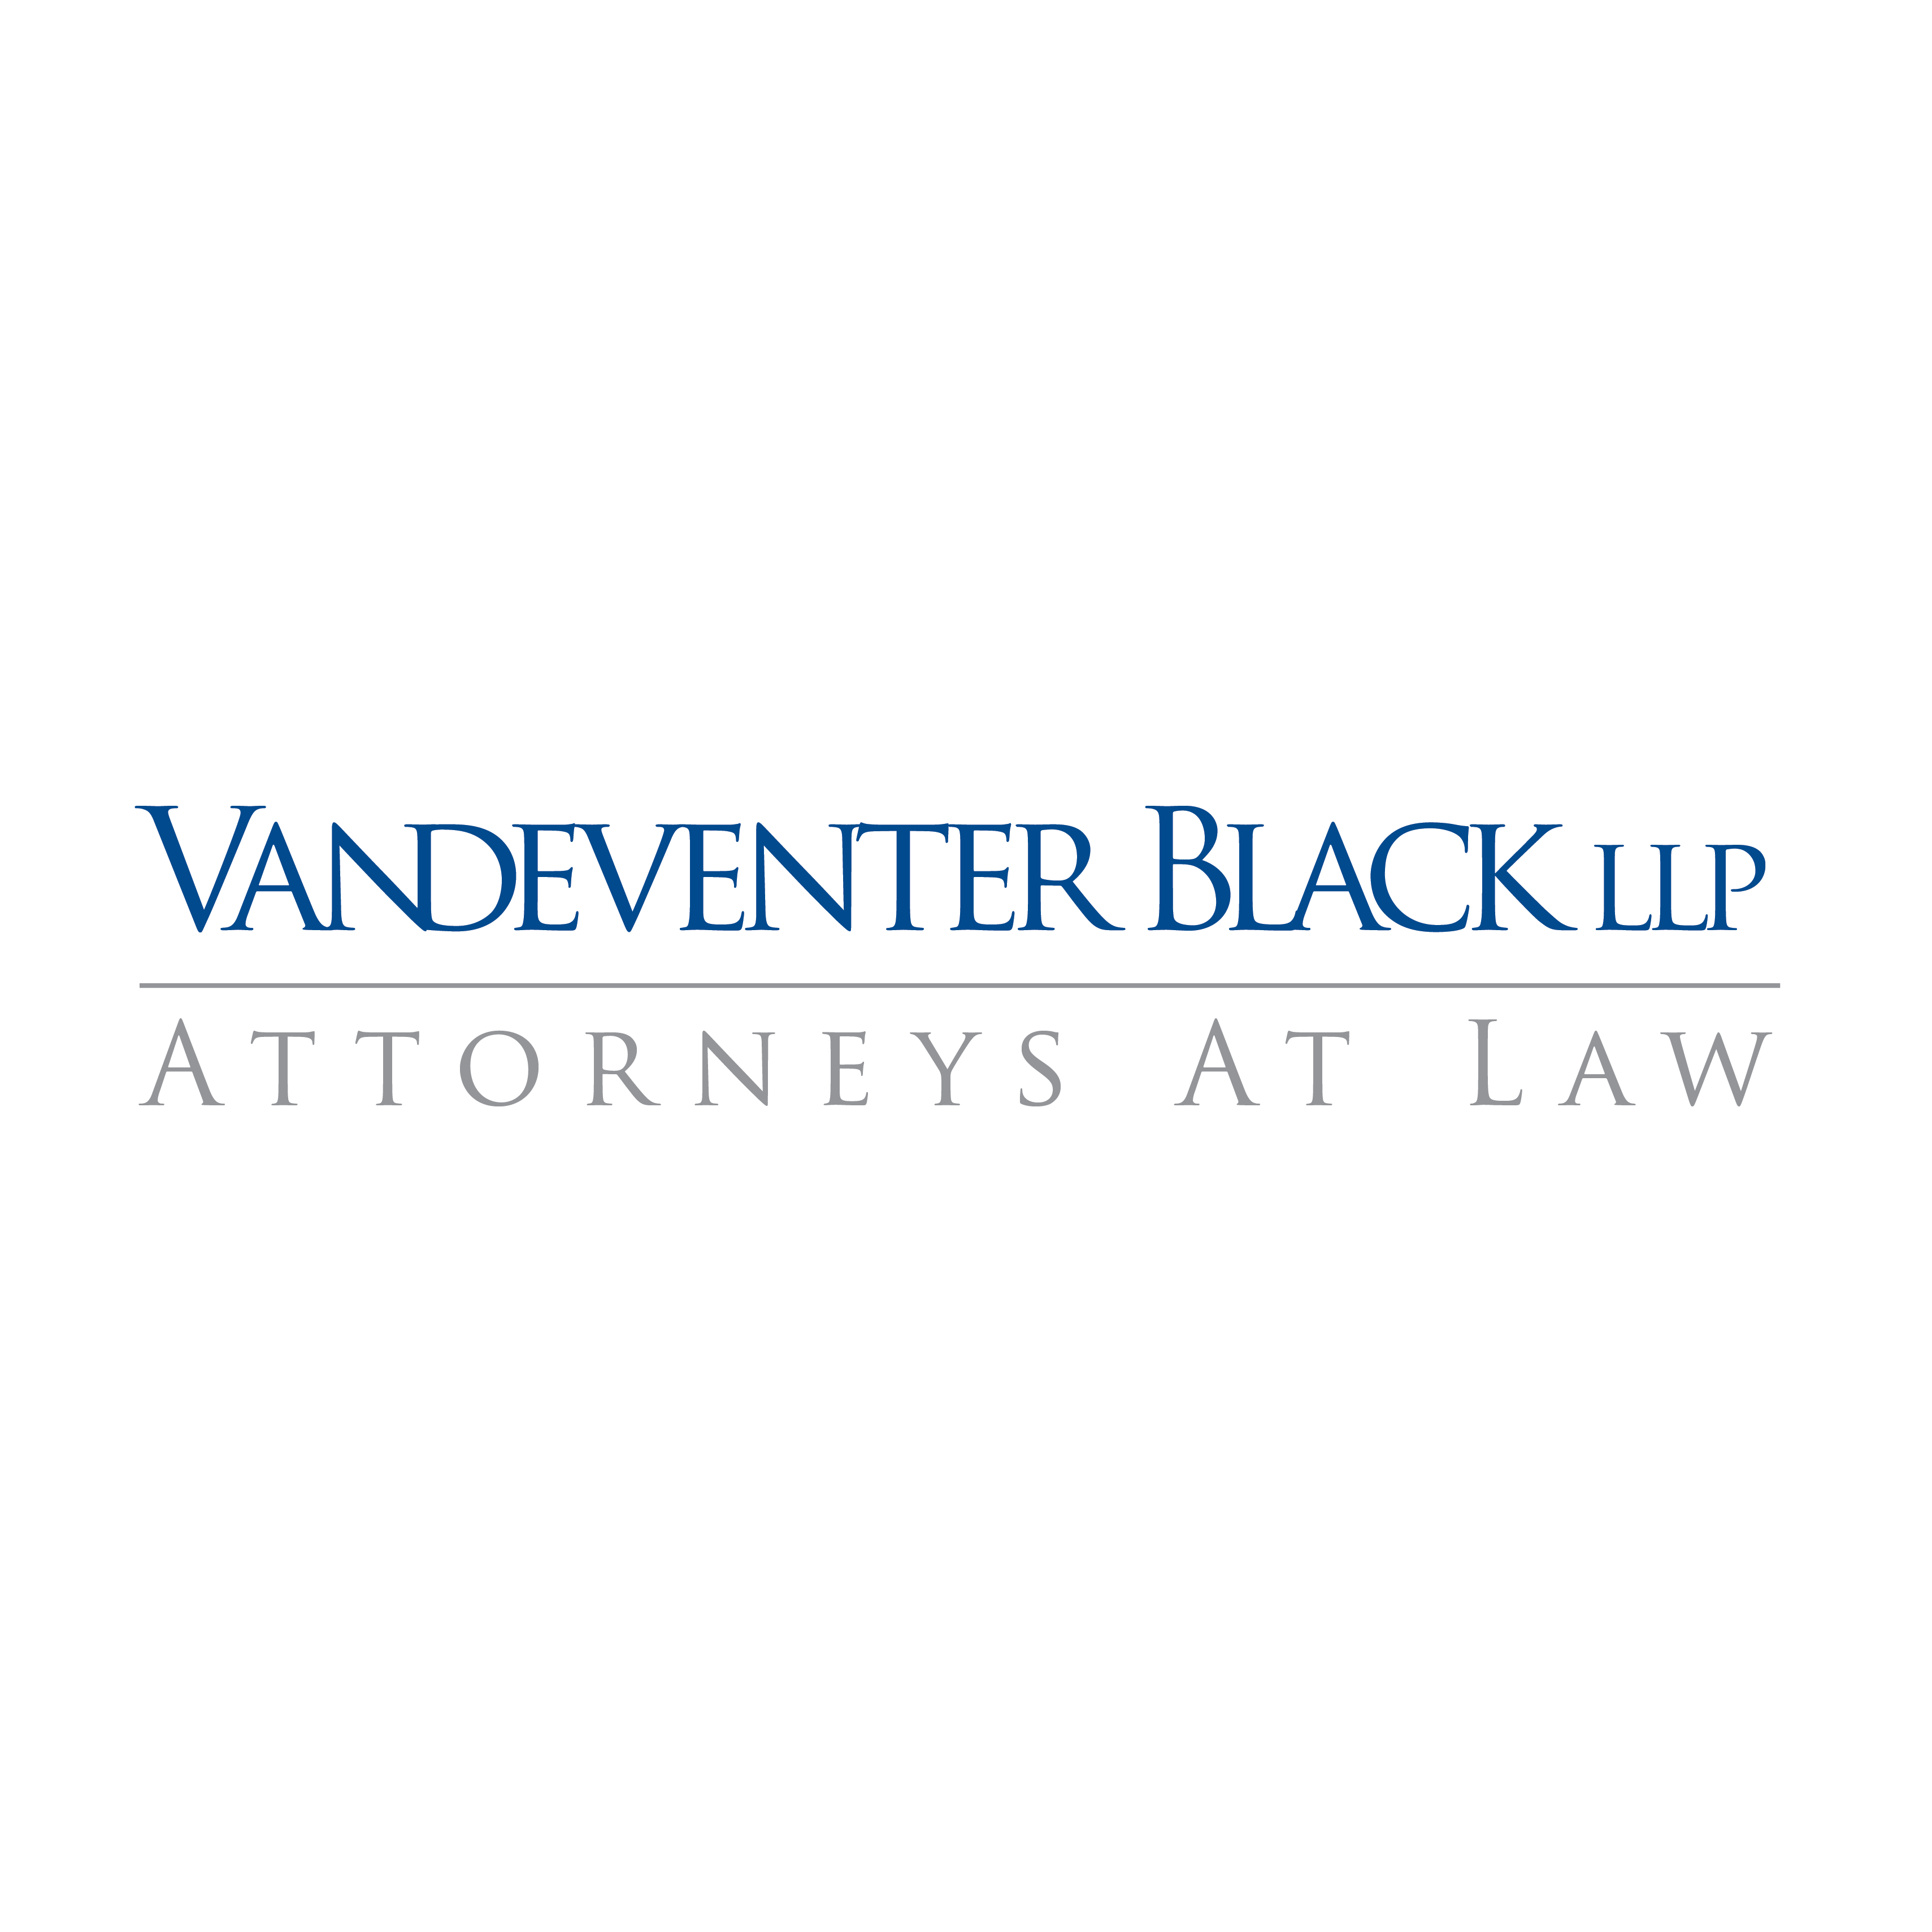 Lawyer in VA Richmond 23219 Vandeventer Black LLP 901 E. Byrd St. Suite 1600 (804)237-8800